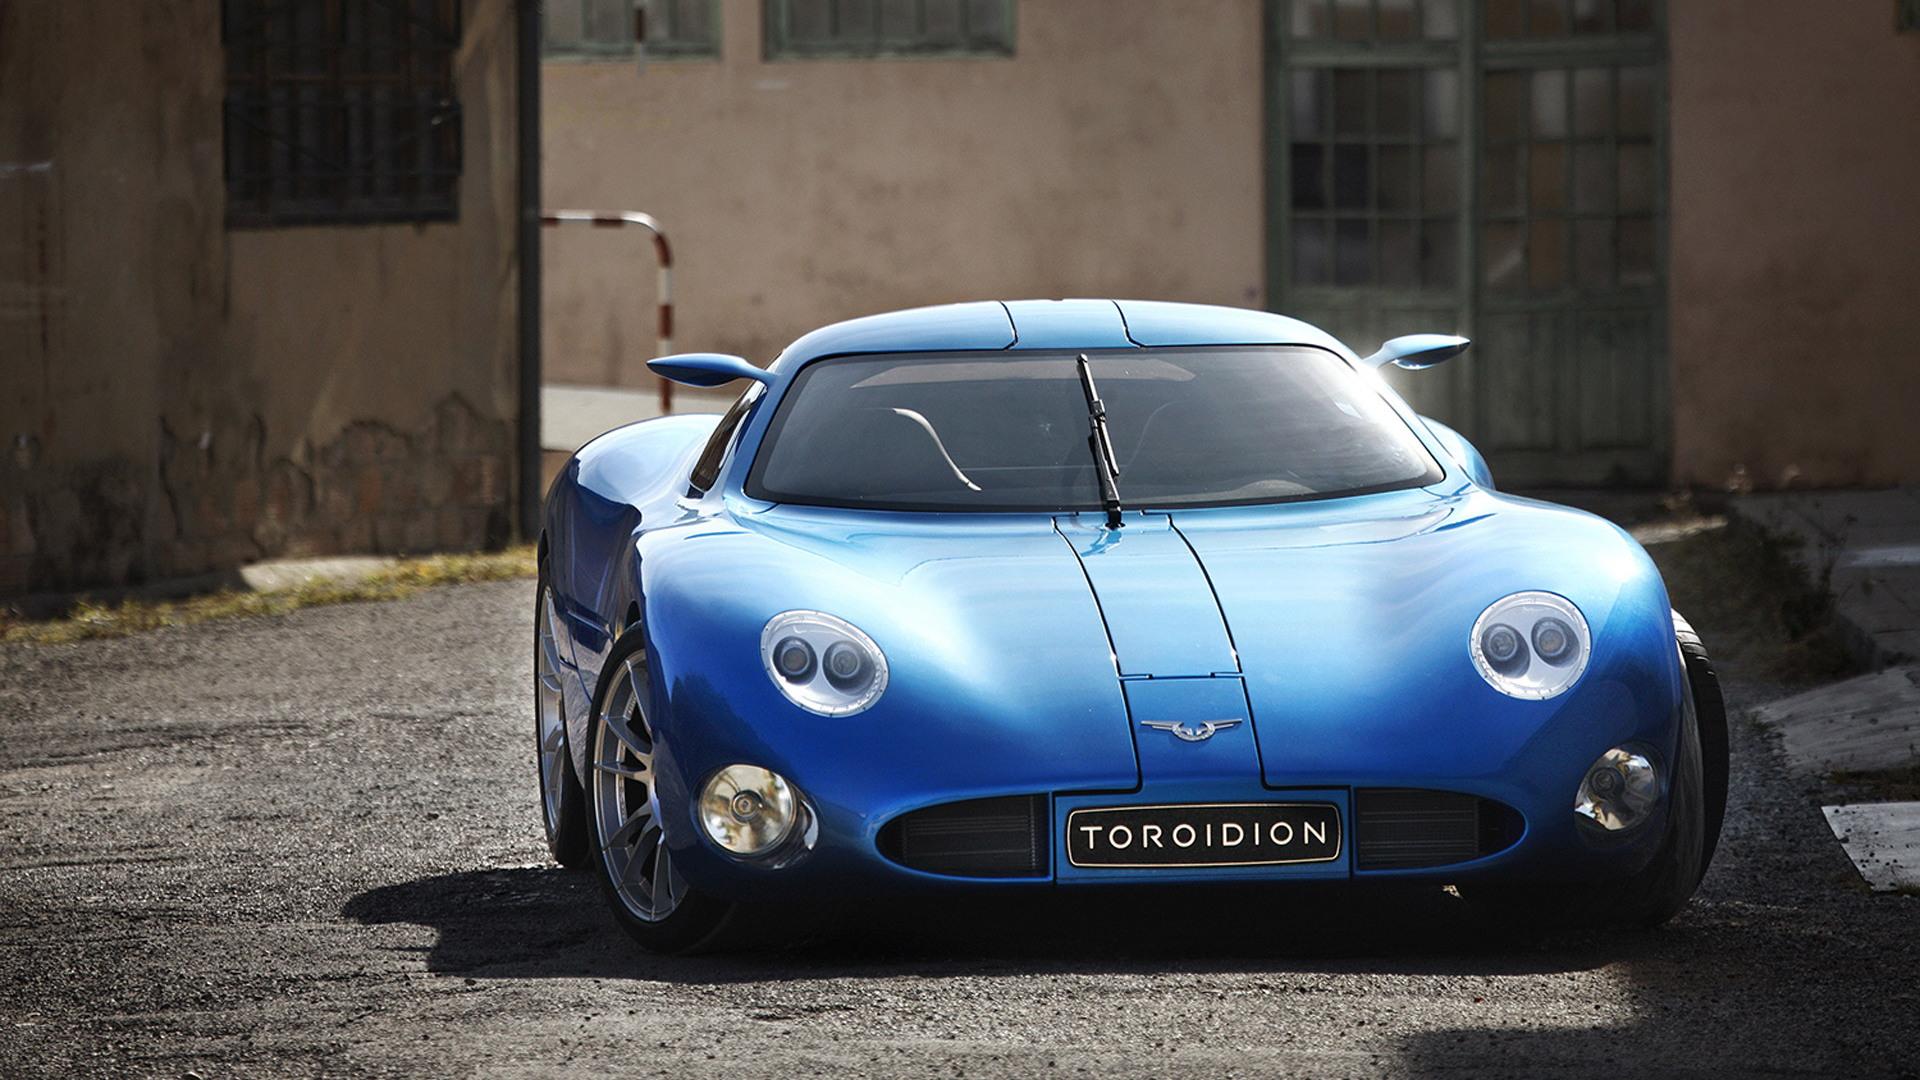 Toroidion concept, 2015 Top Marques Monaco